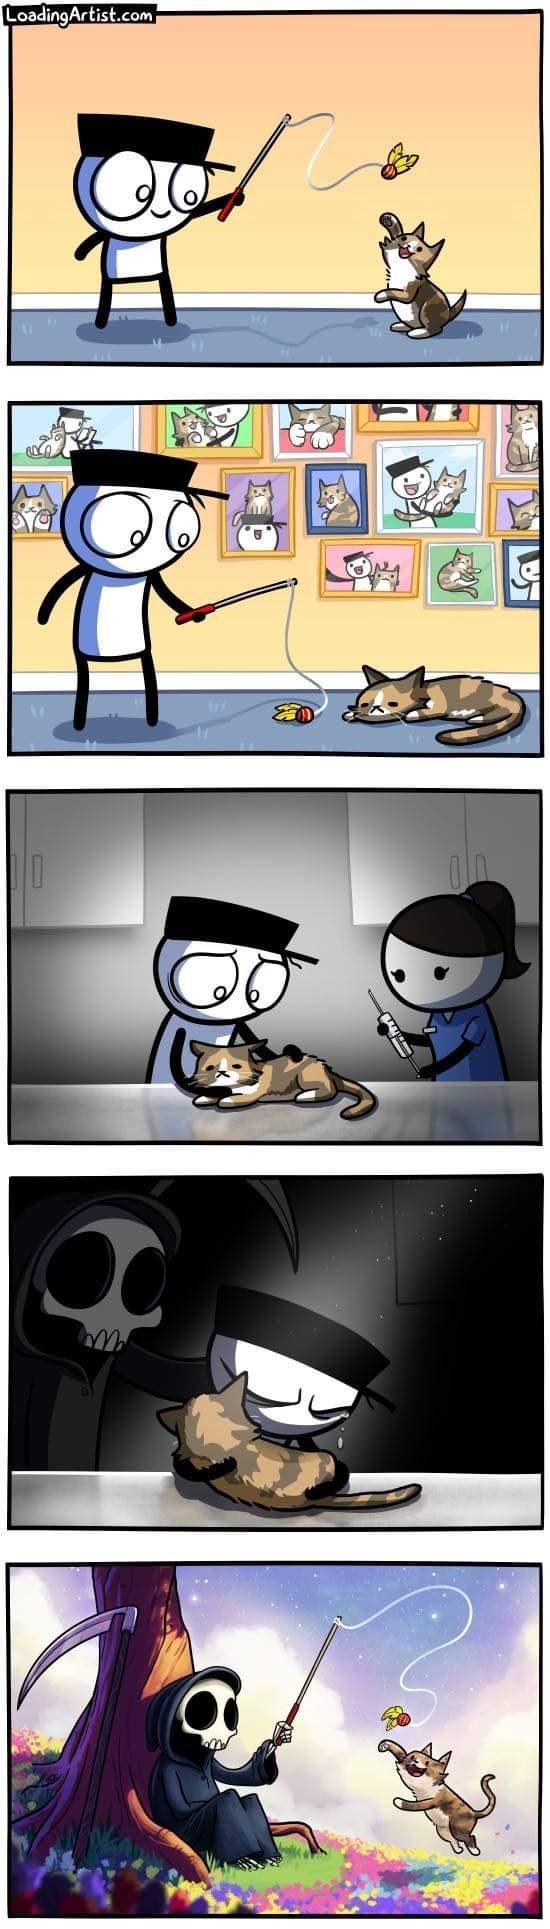 Cartoon - LoadingArtist.com